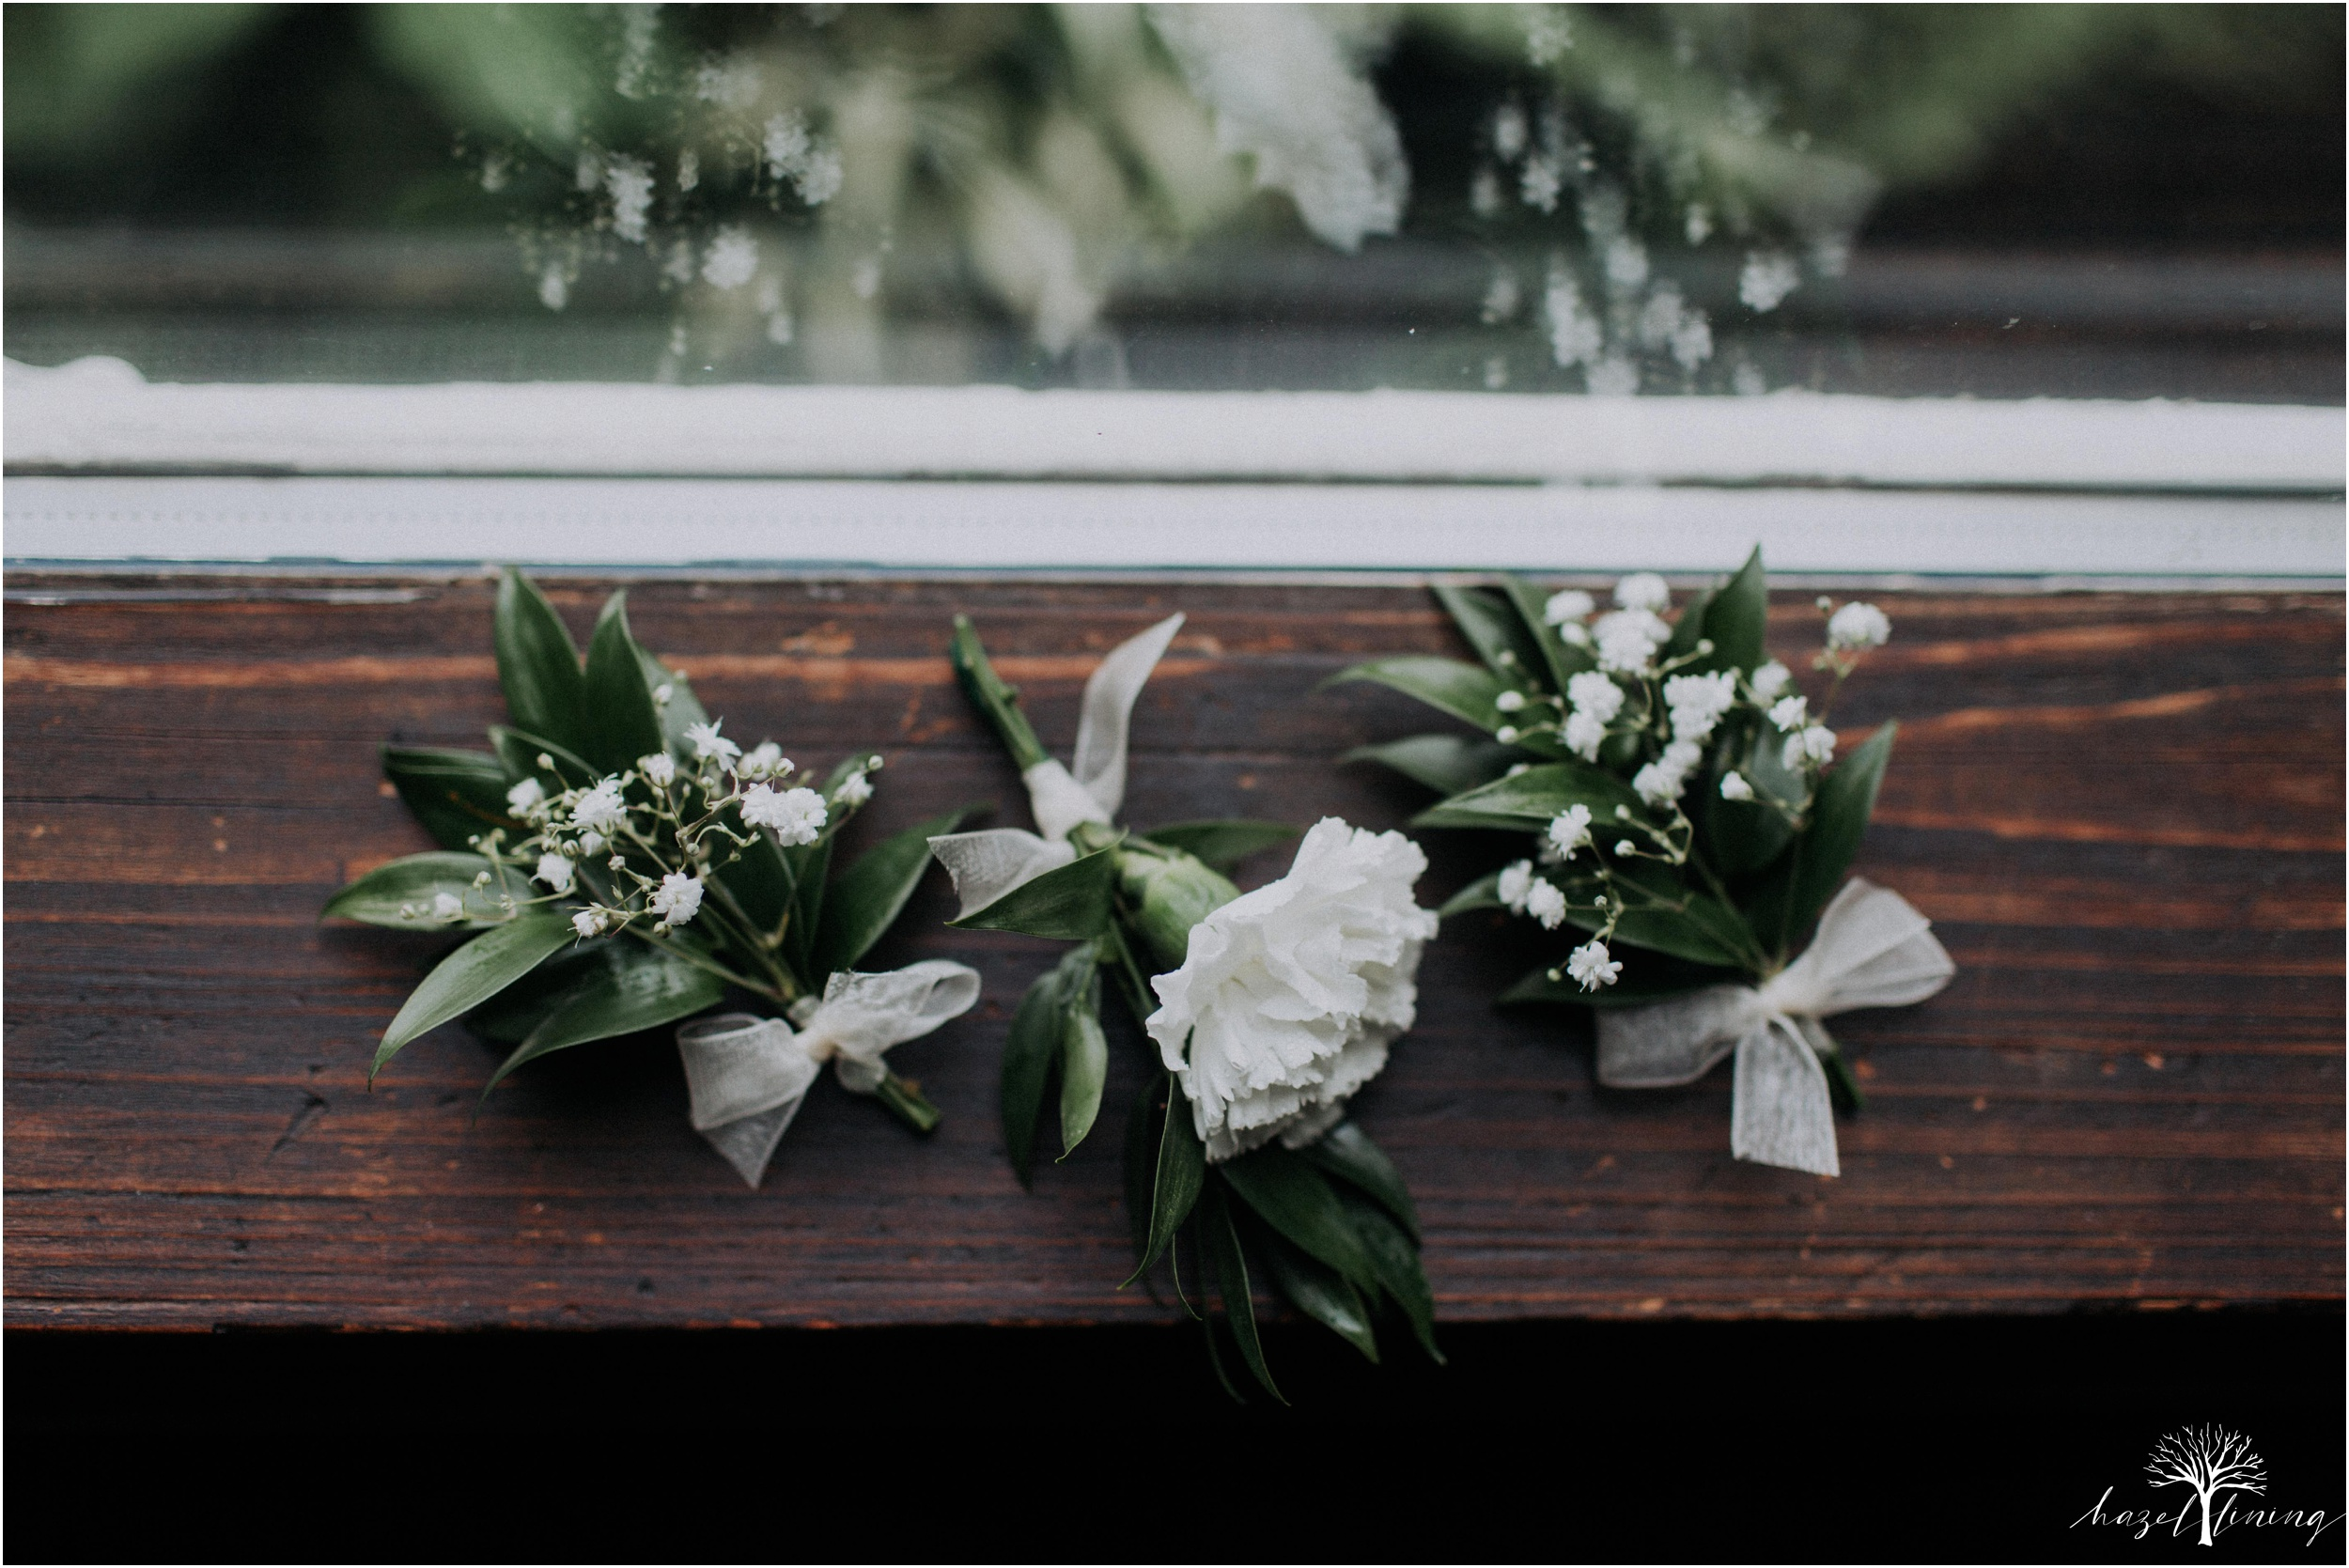 mariah-kreyling-samuel-sherratt-sherrattwiththeworld-peirce-farm-at-witch-hill-boston-massachusetts-wedding-photography-hazel-lining-travel-wedding-elopement-photography_0018.jpg